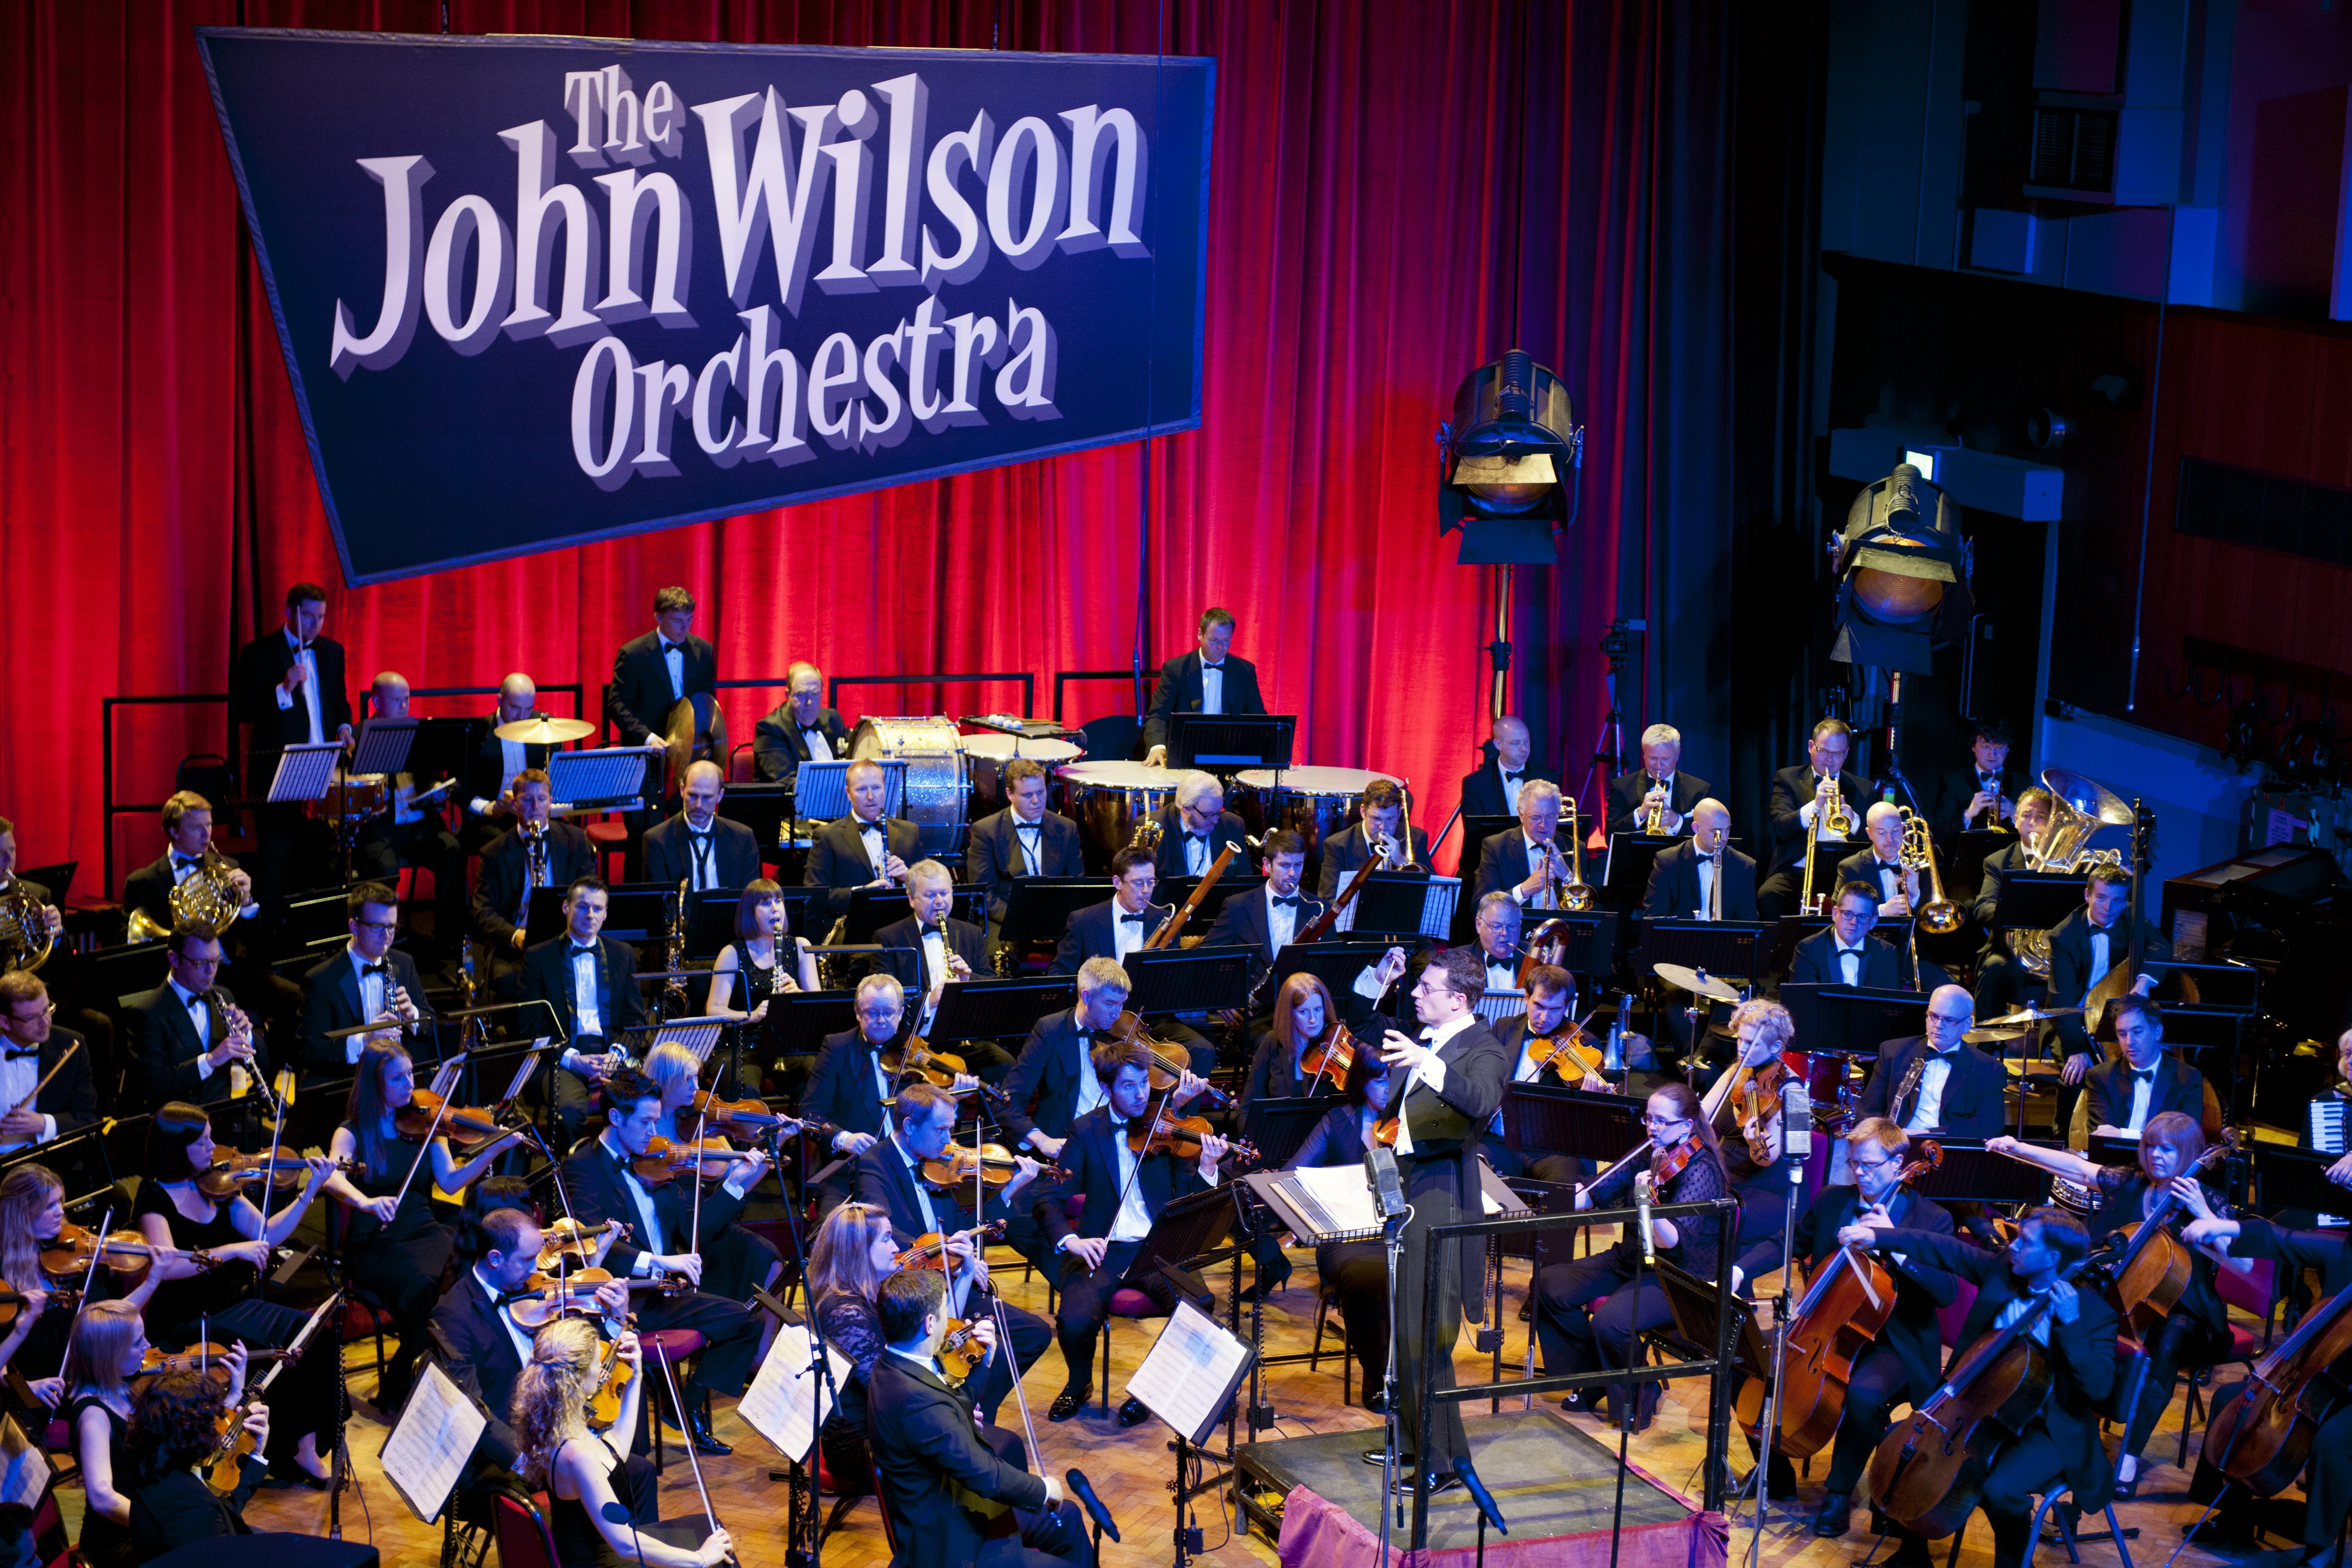 John Wilson Orchestra Launch Caroline Hilton